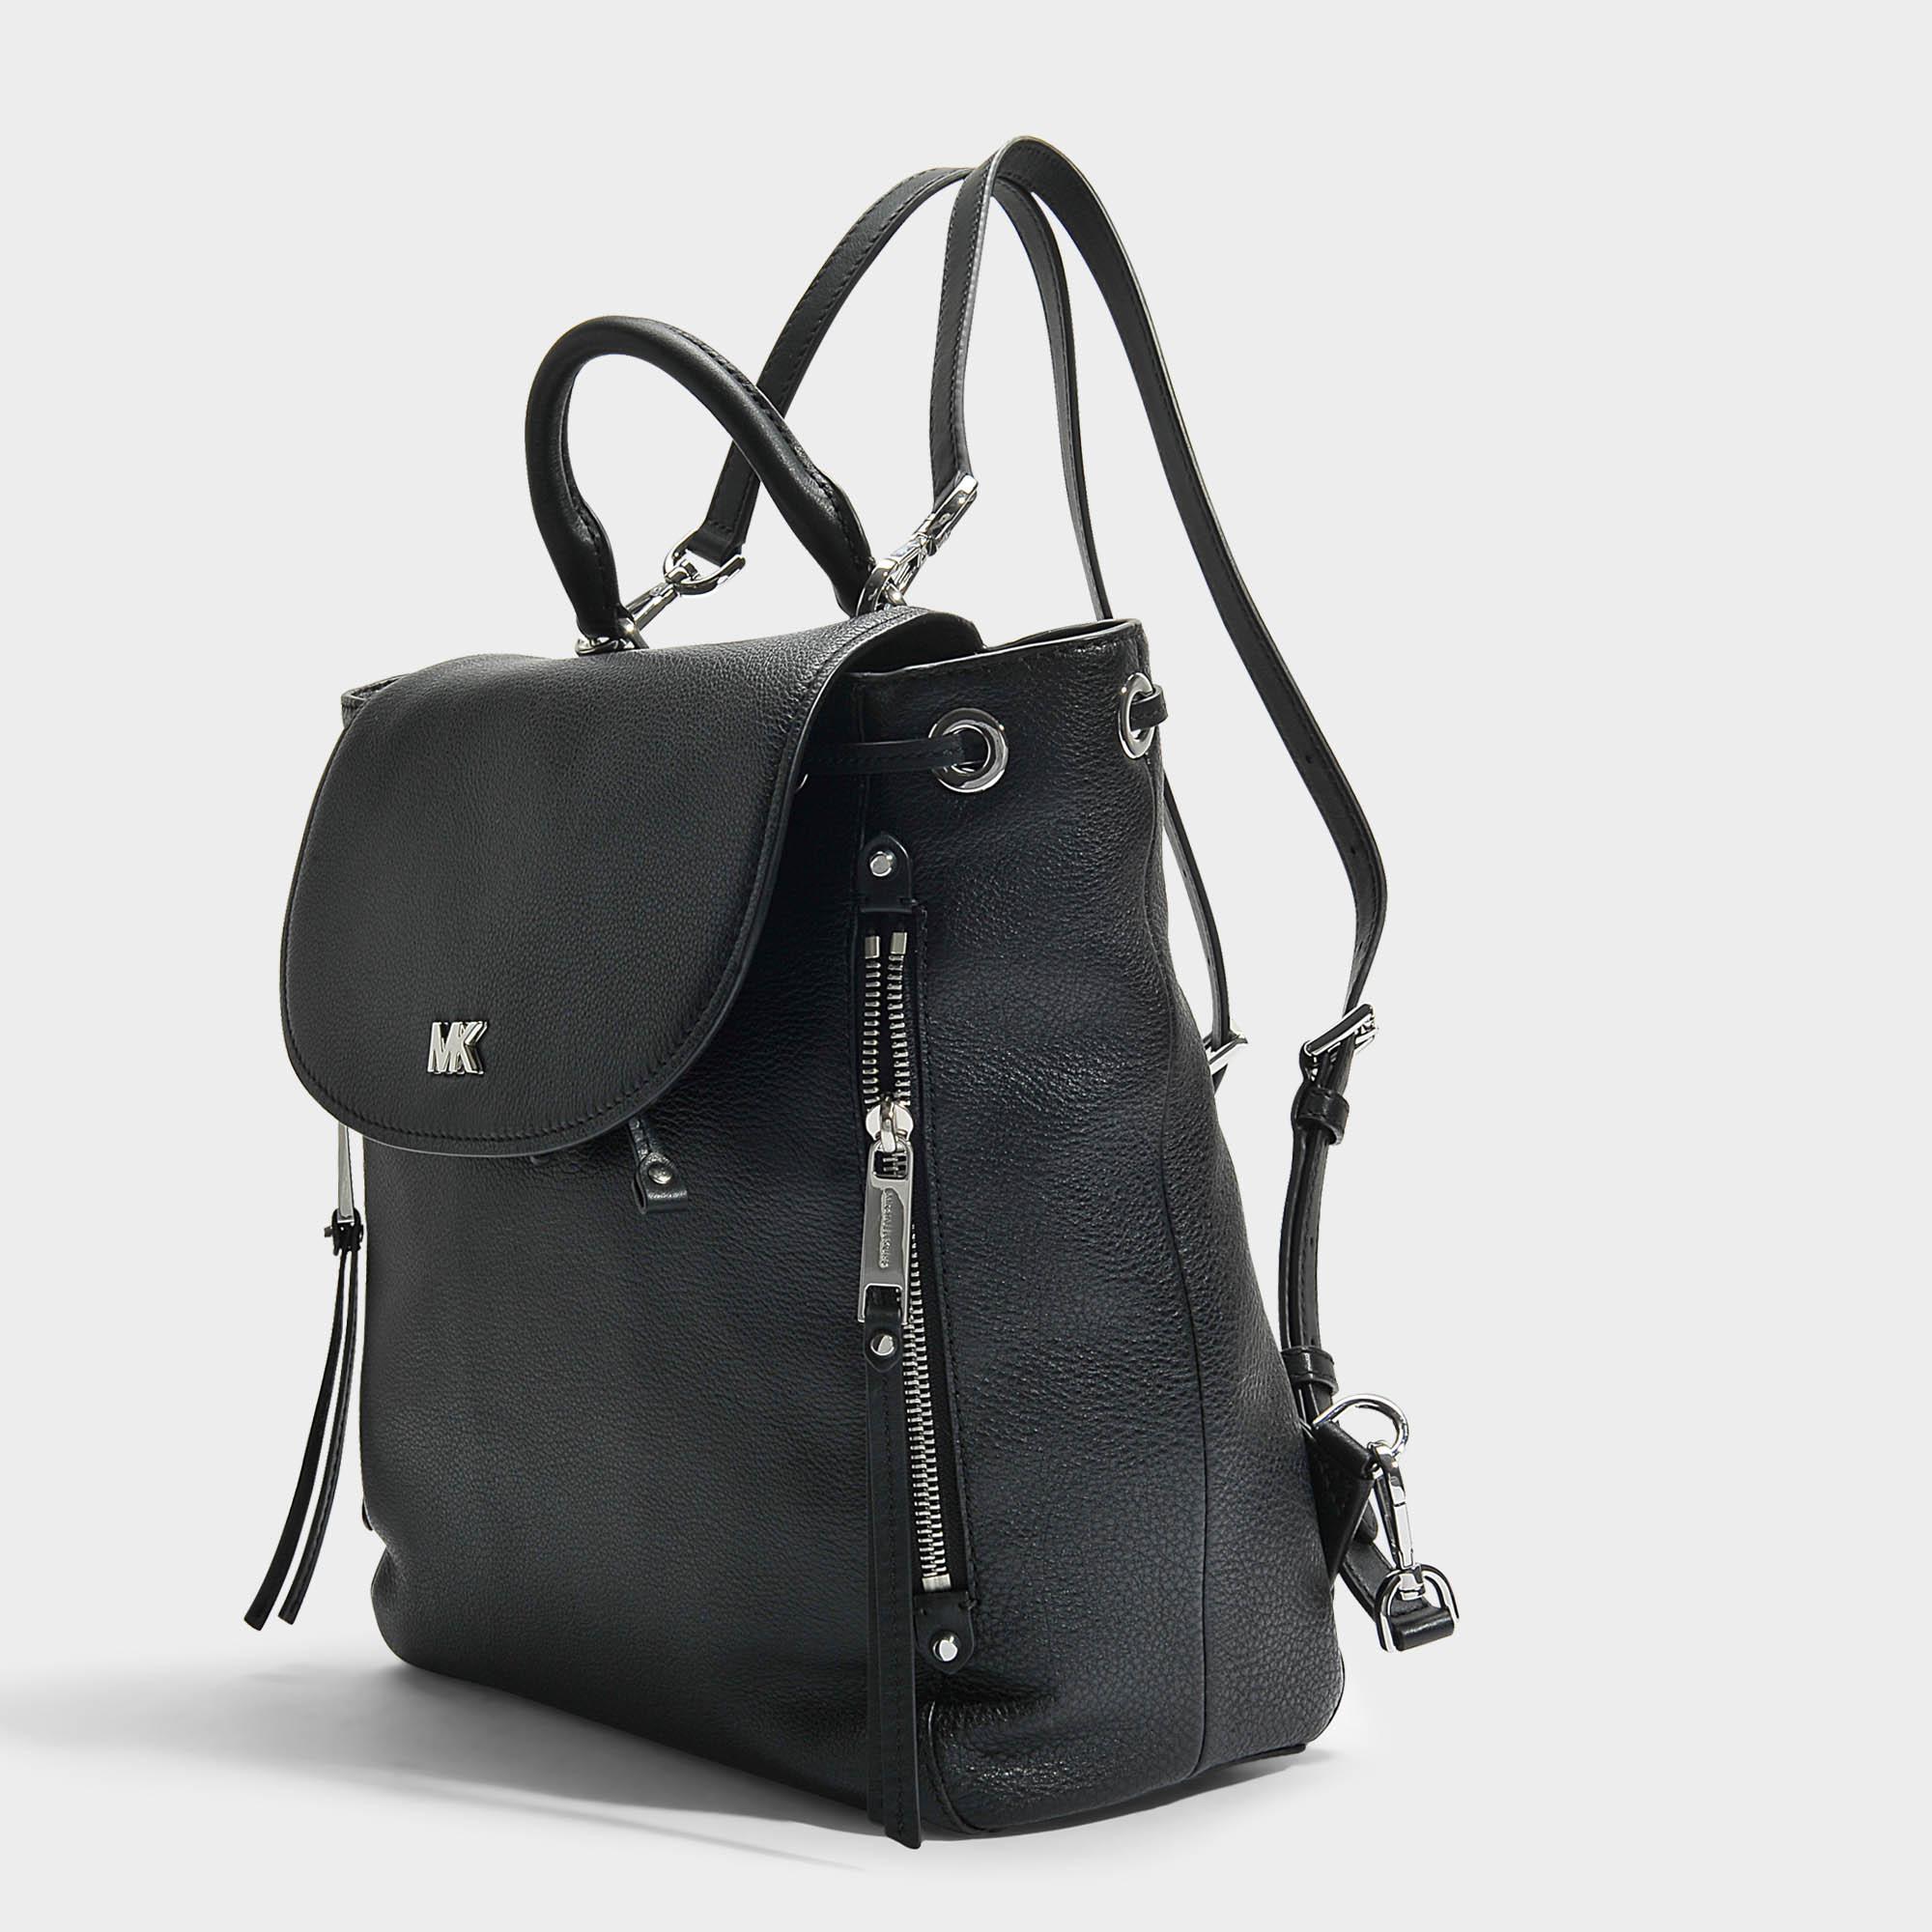 Evie Medium Backpack in Black Small Pebble Leather Michael Michael Kors 9AoCfNp